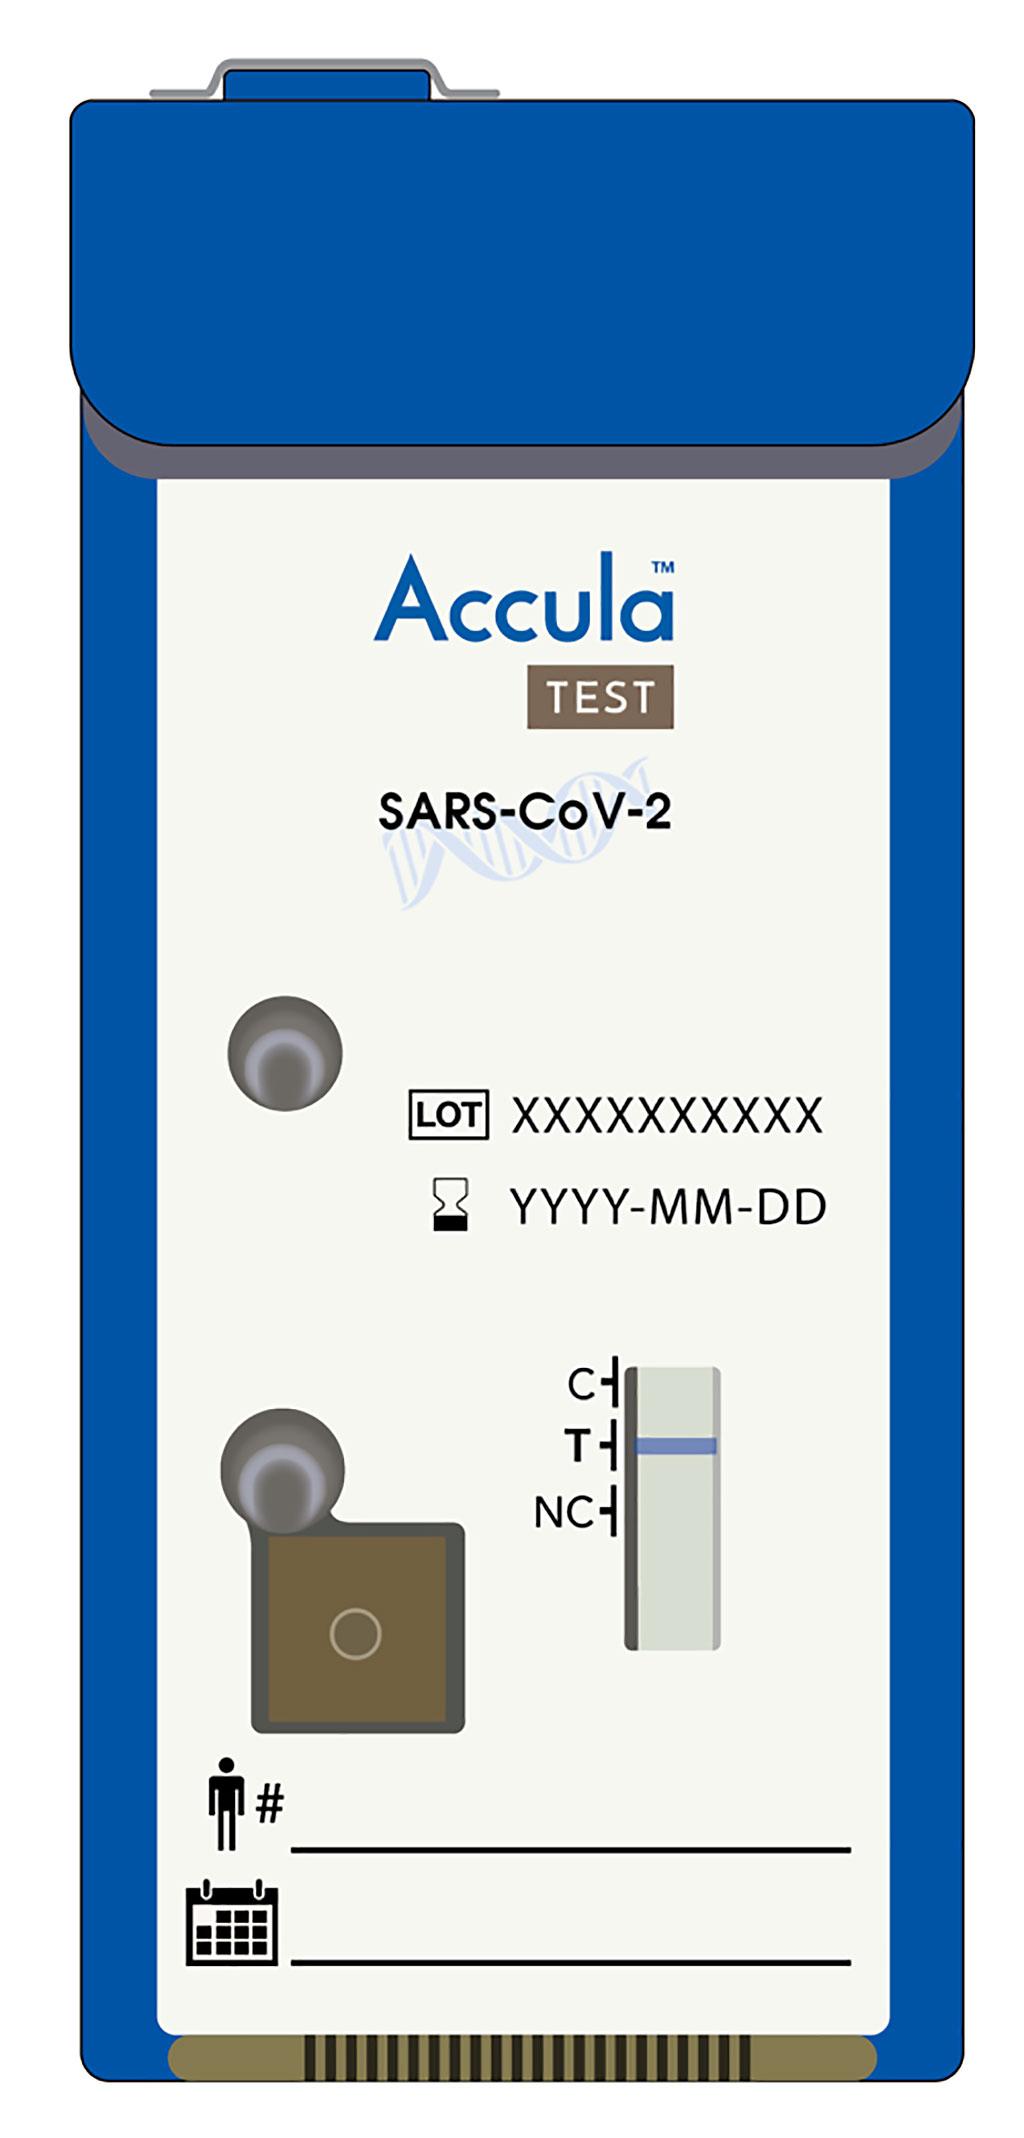 Image: Mesa's Accula SARS-CoV-2 Test (Photo courtesy of Mesa Biotech)